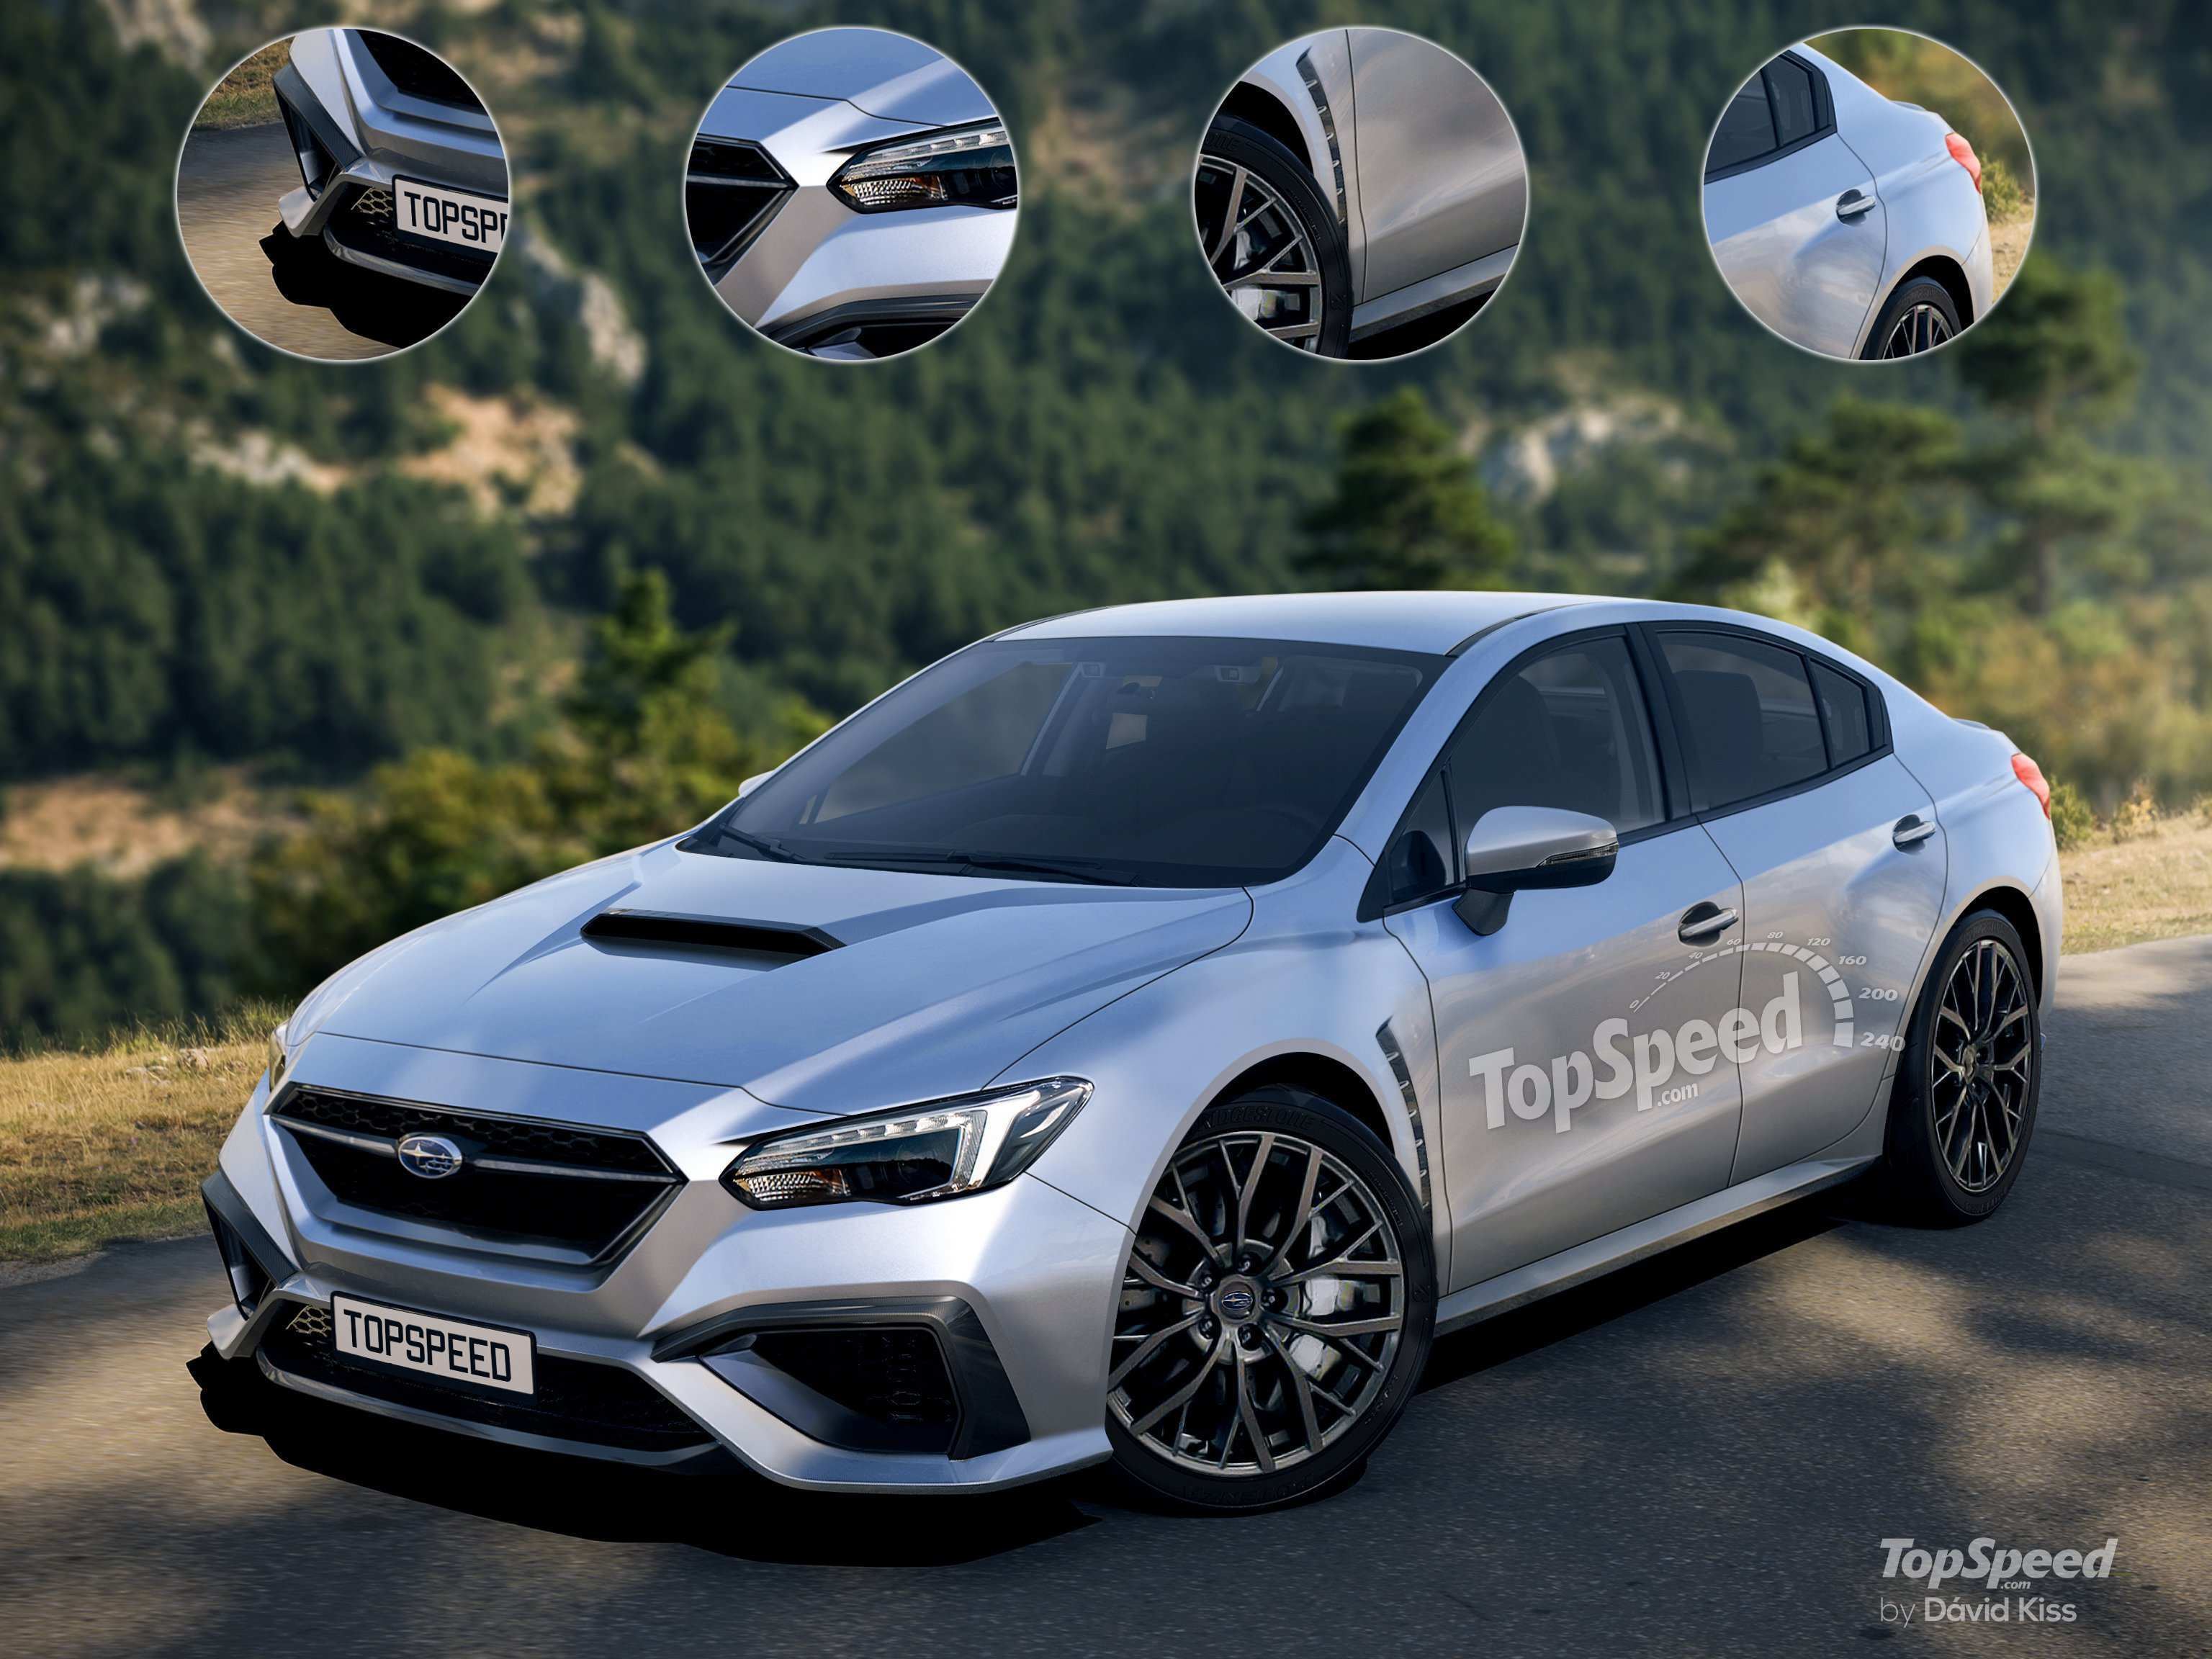 27 Great 2020 Subaru Wrx Series Gray Release with 2020 Subaru Wrx Series Gray